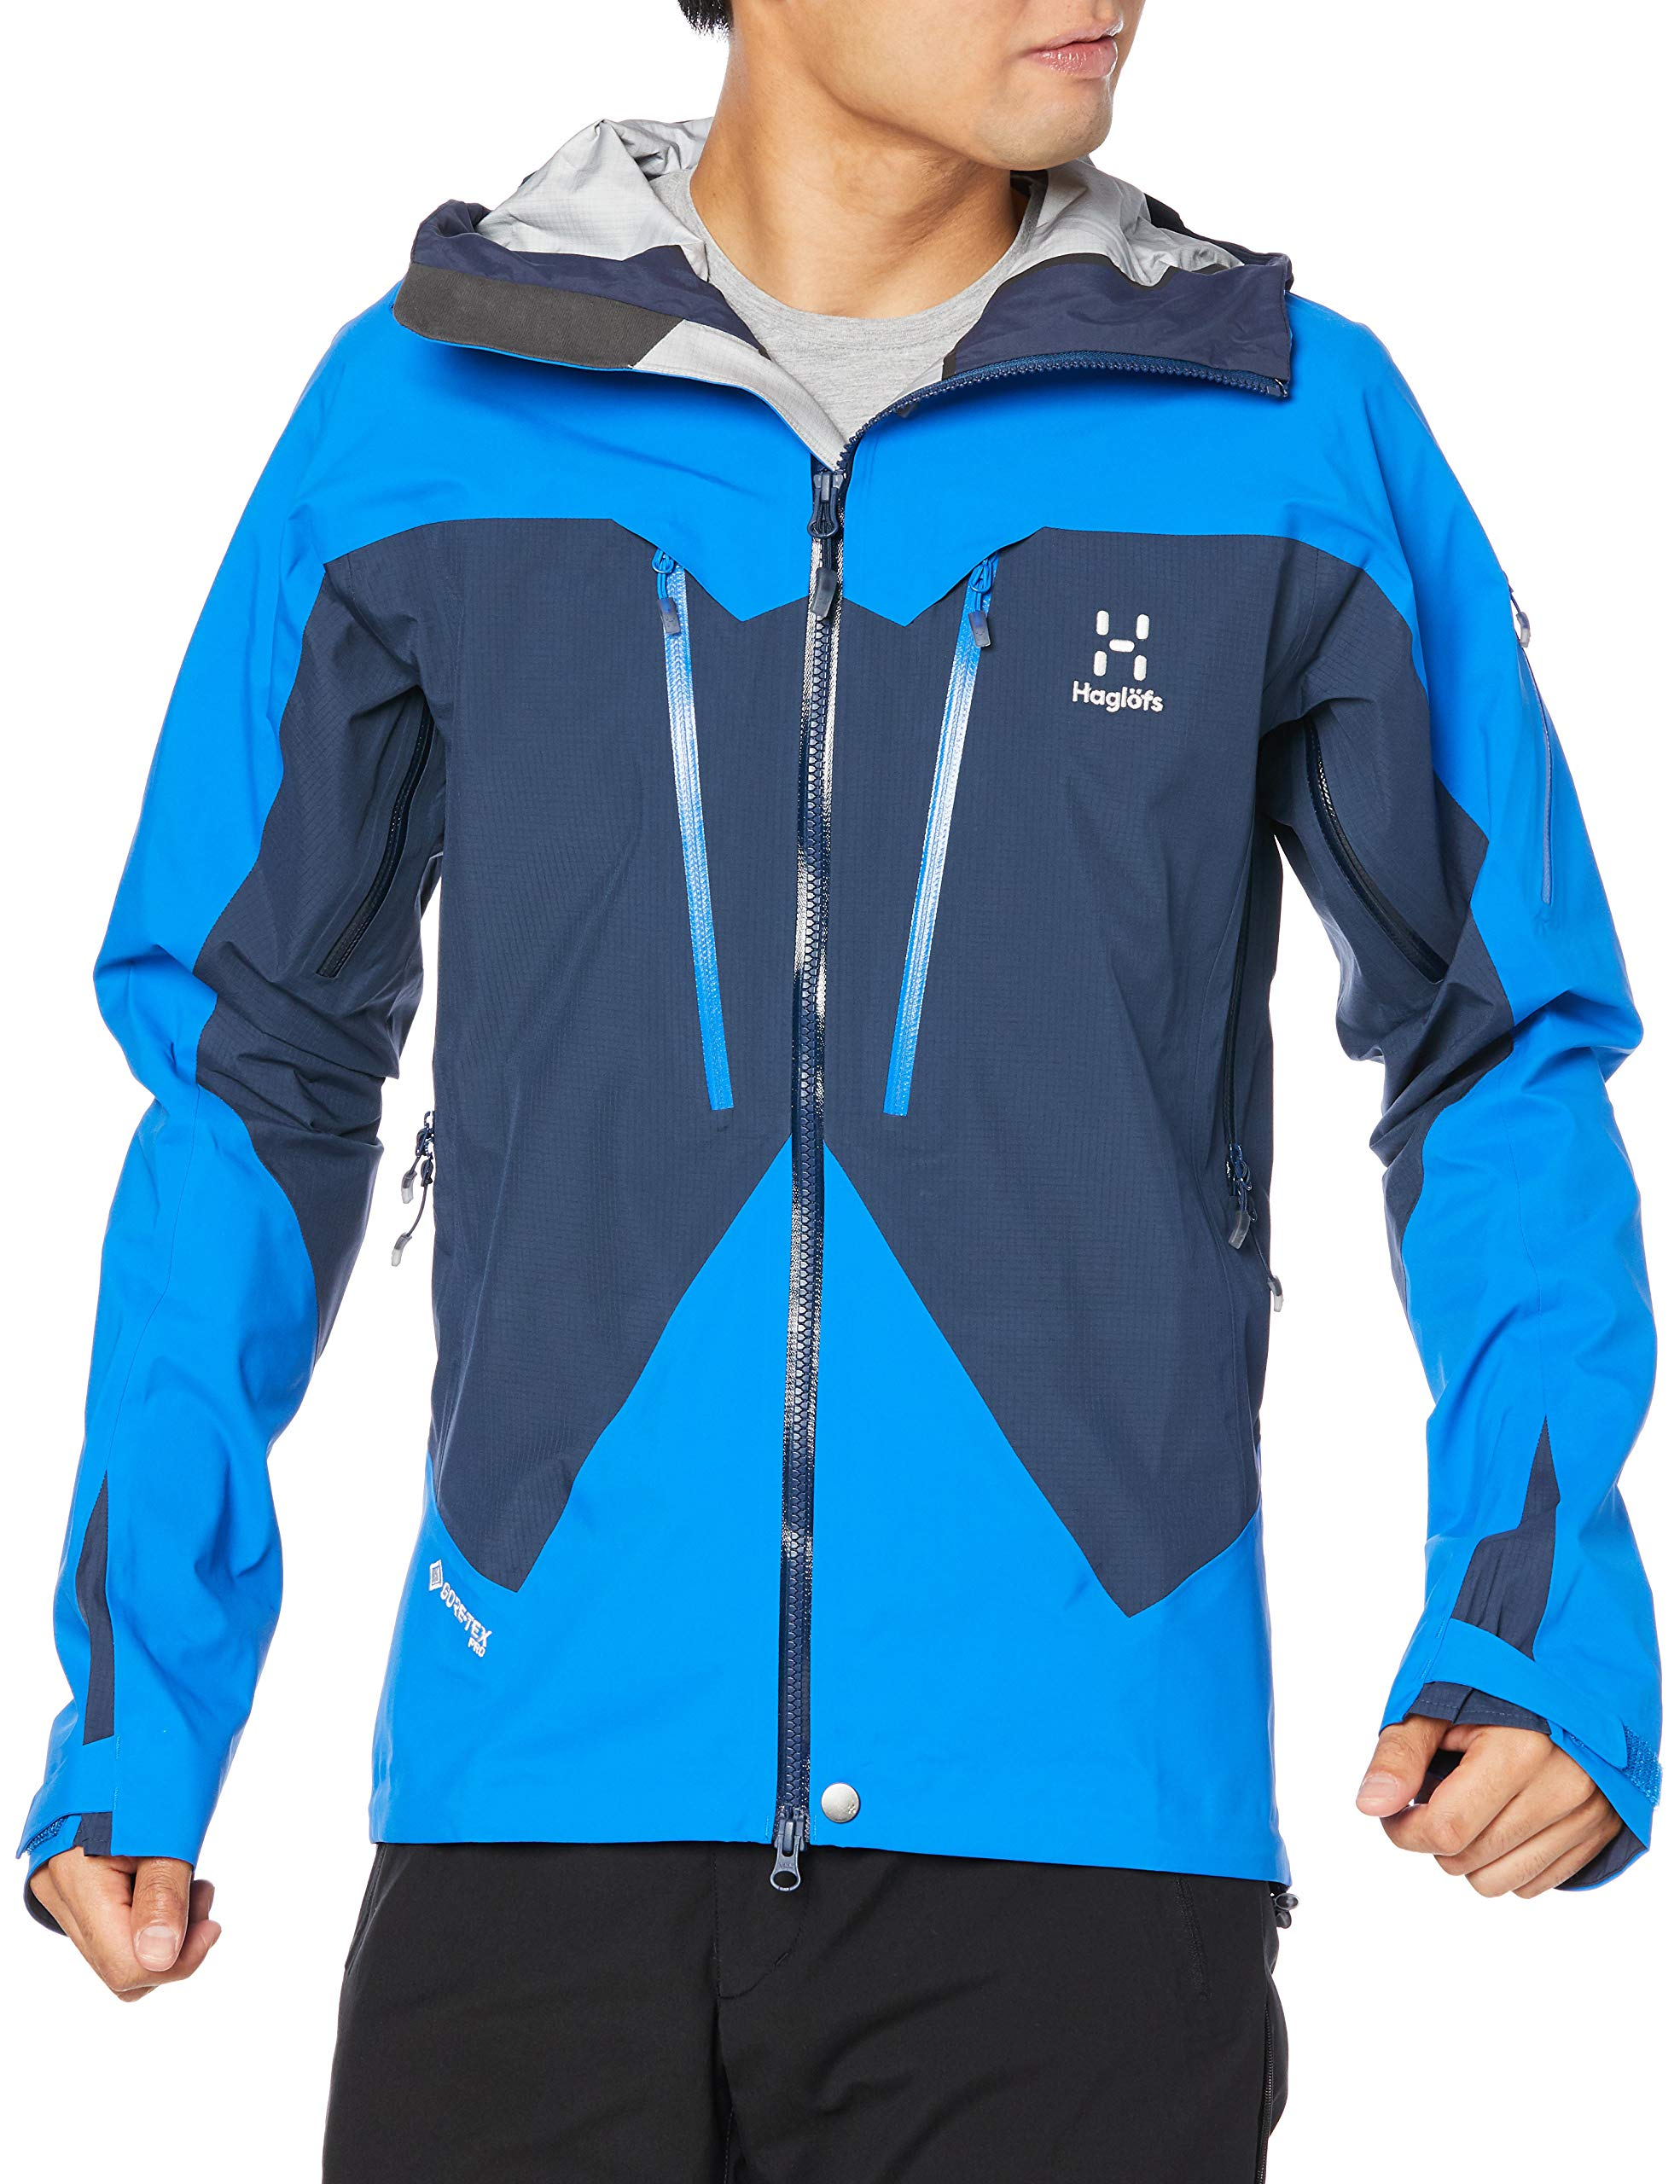 Haglöfs Spitz Jacken, Blau (tarn Blue) / Größe: S, Small